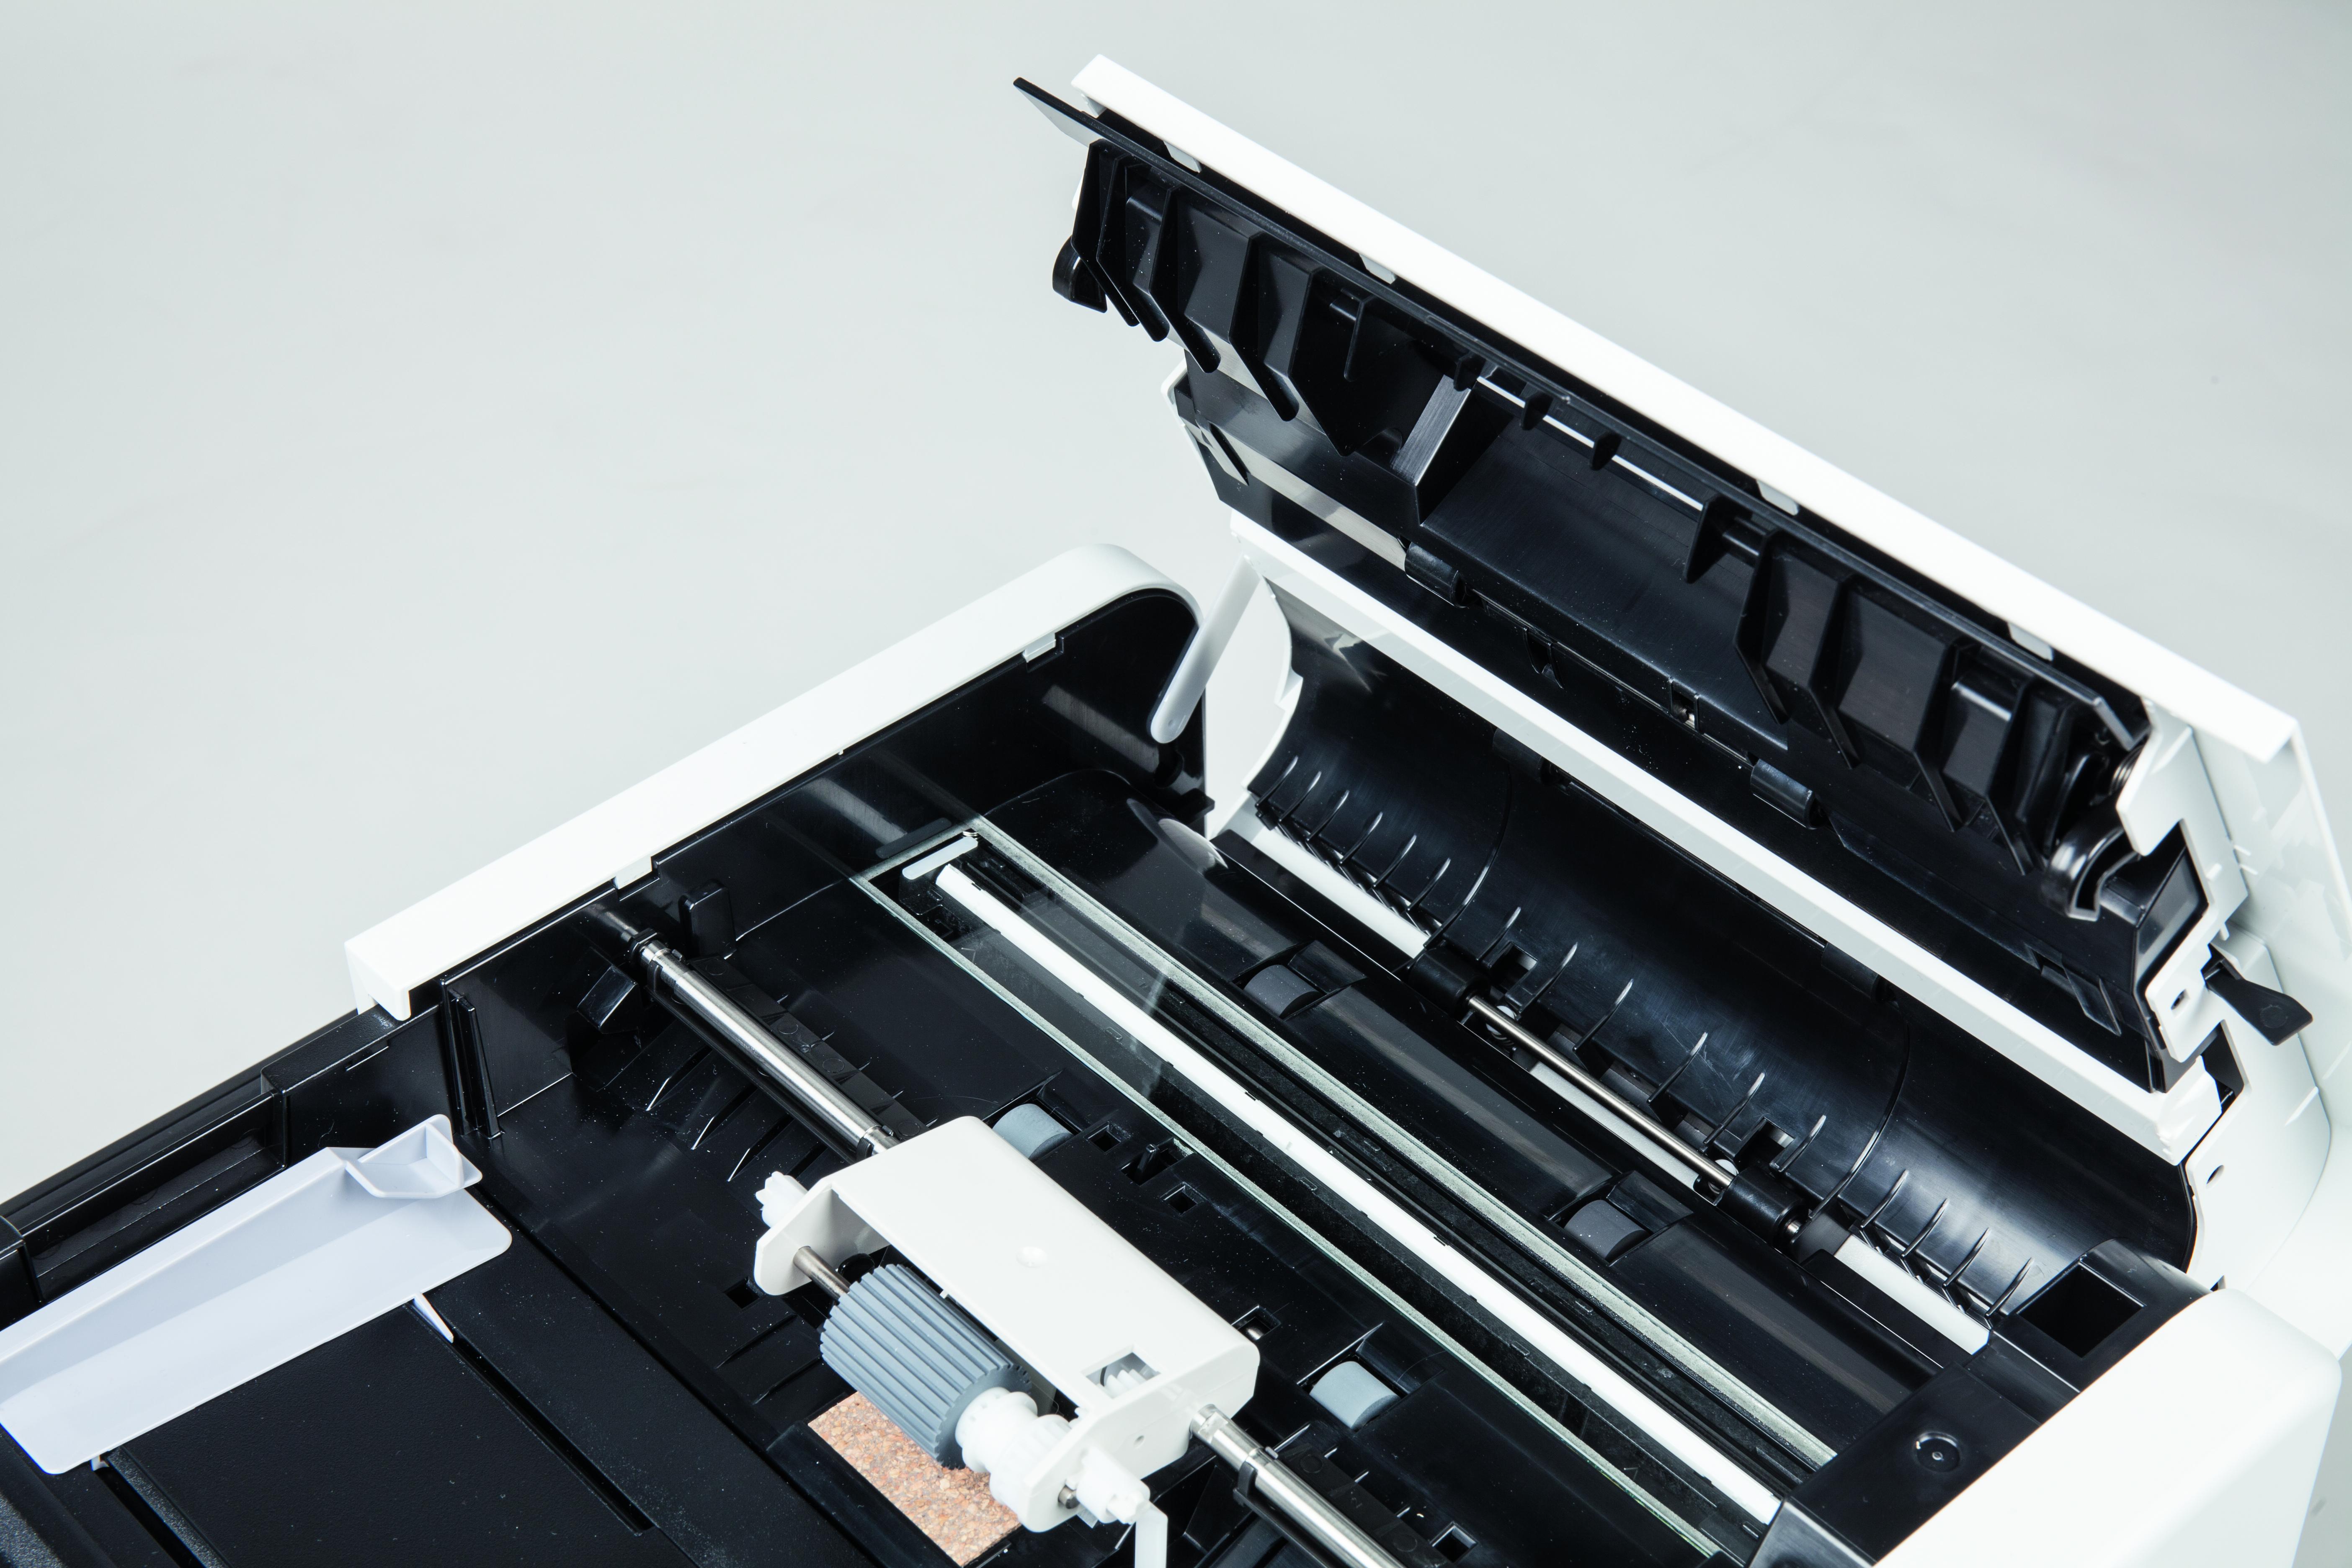 ADF DADF documentinvoer feeder laserprinter dubbelzijdig printkosten multifunctional zzp kantoor scannen kopie